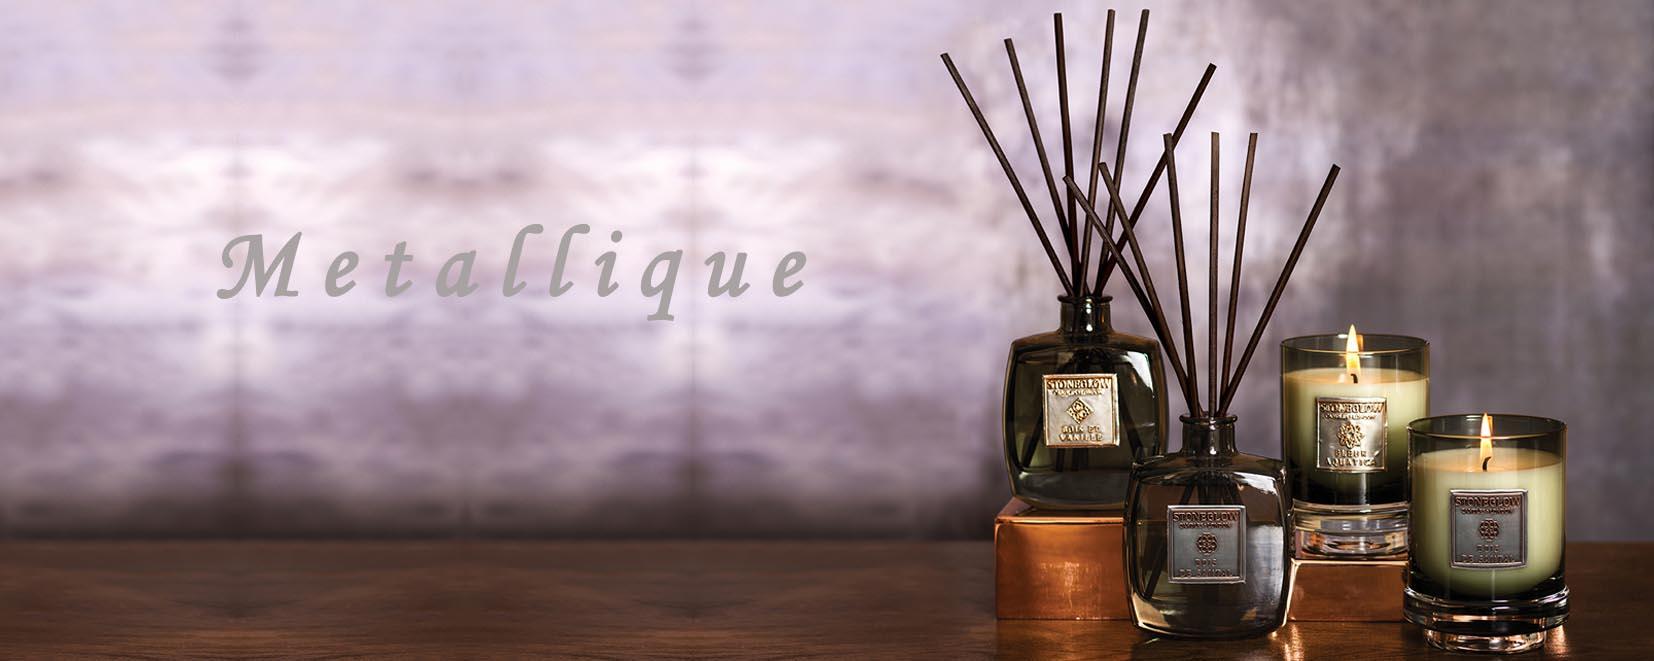 metallique-collection-header.jpg